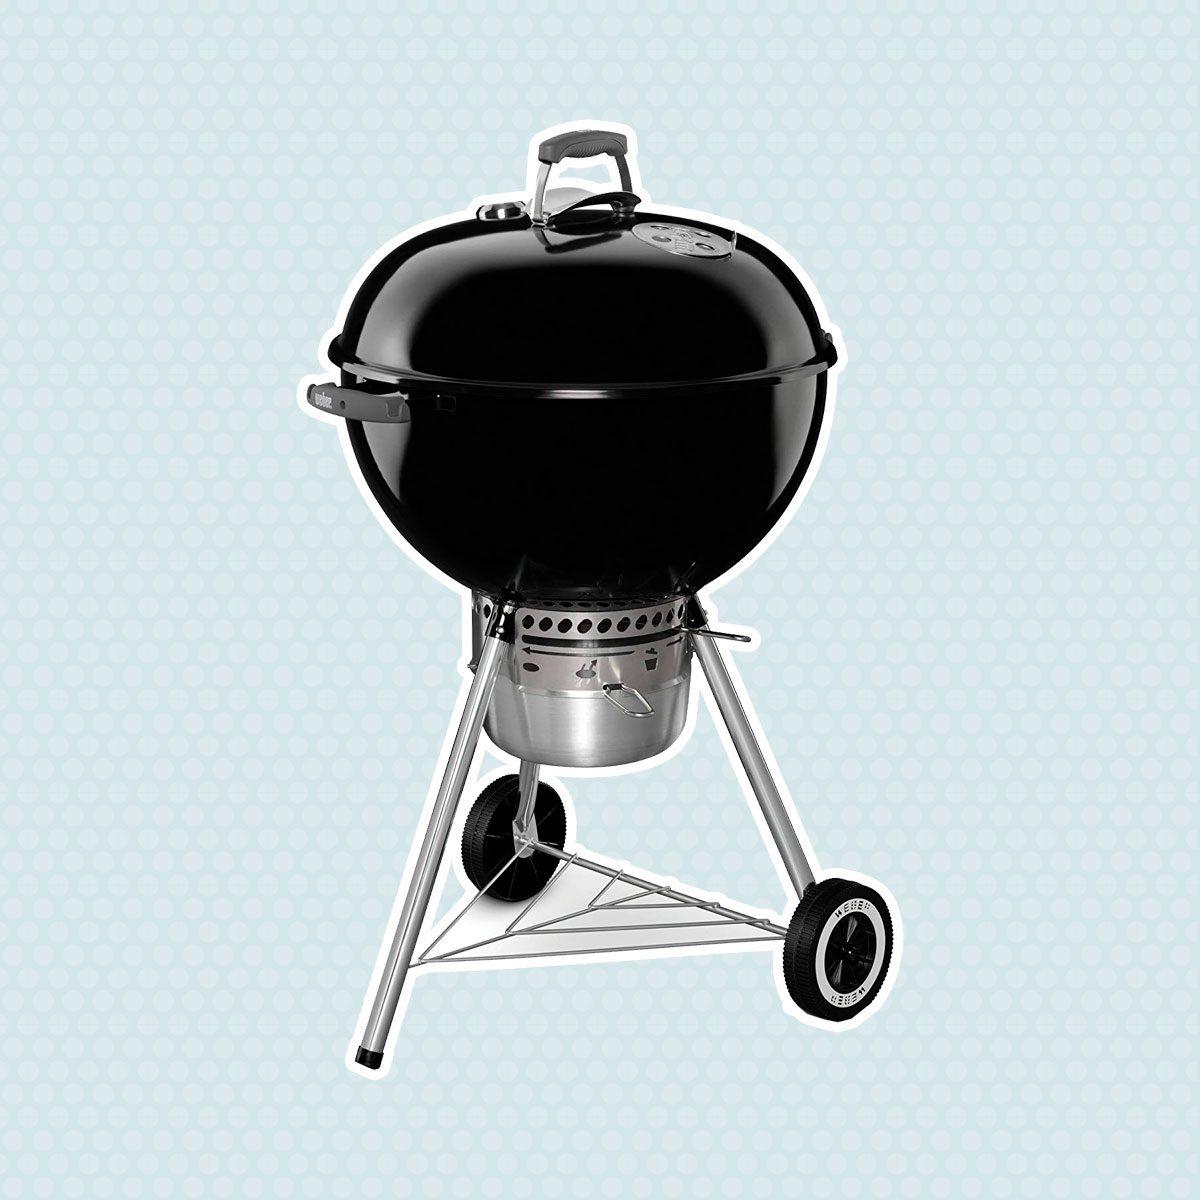 Weber Original Charcoal Grill